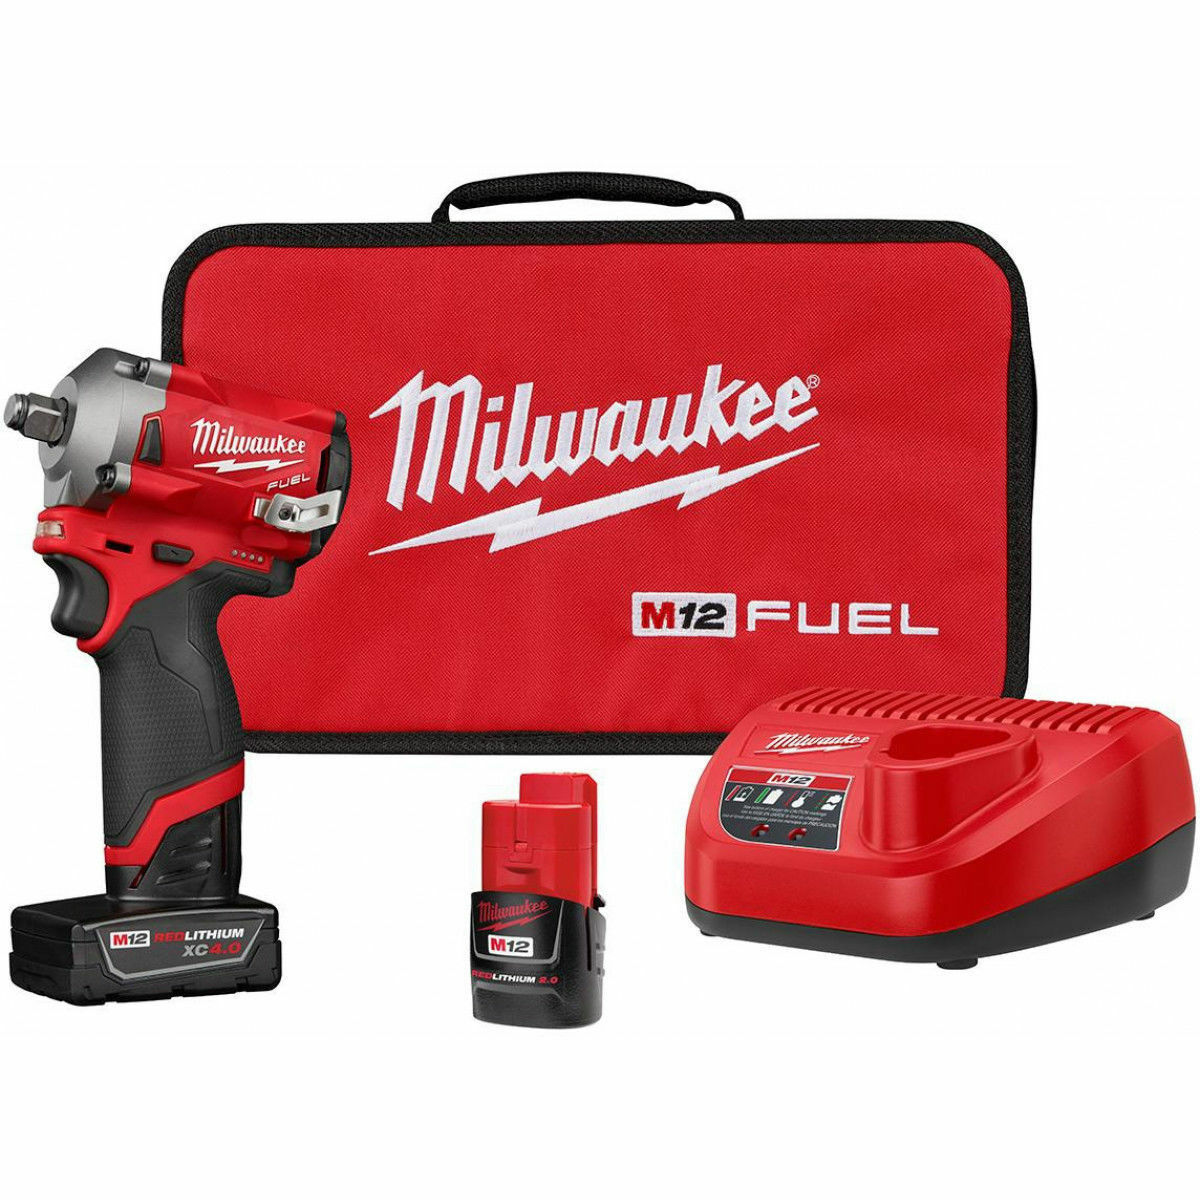 Milwaukee 2555-22 M12 FUEL Stubby Cordless 1/2